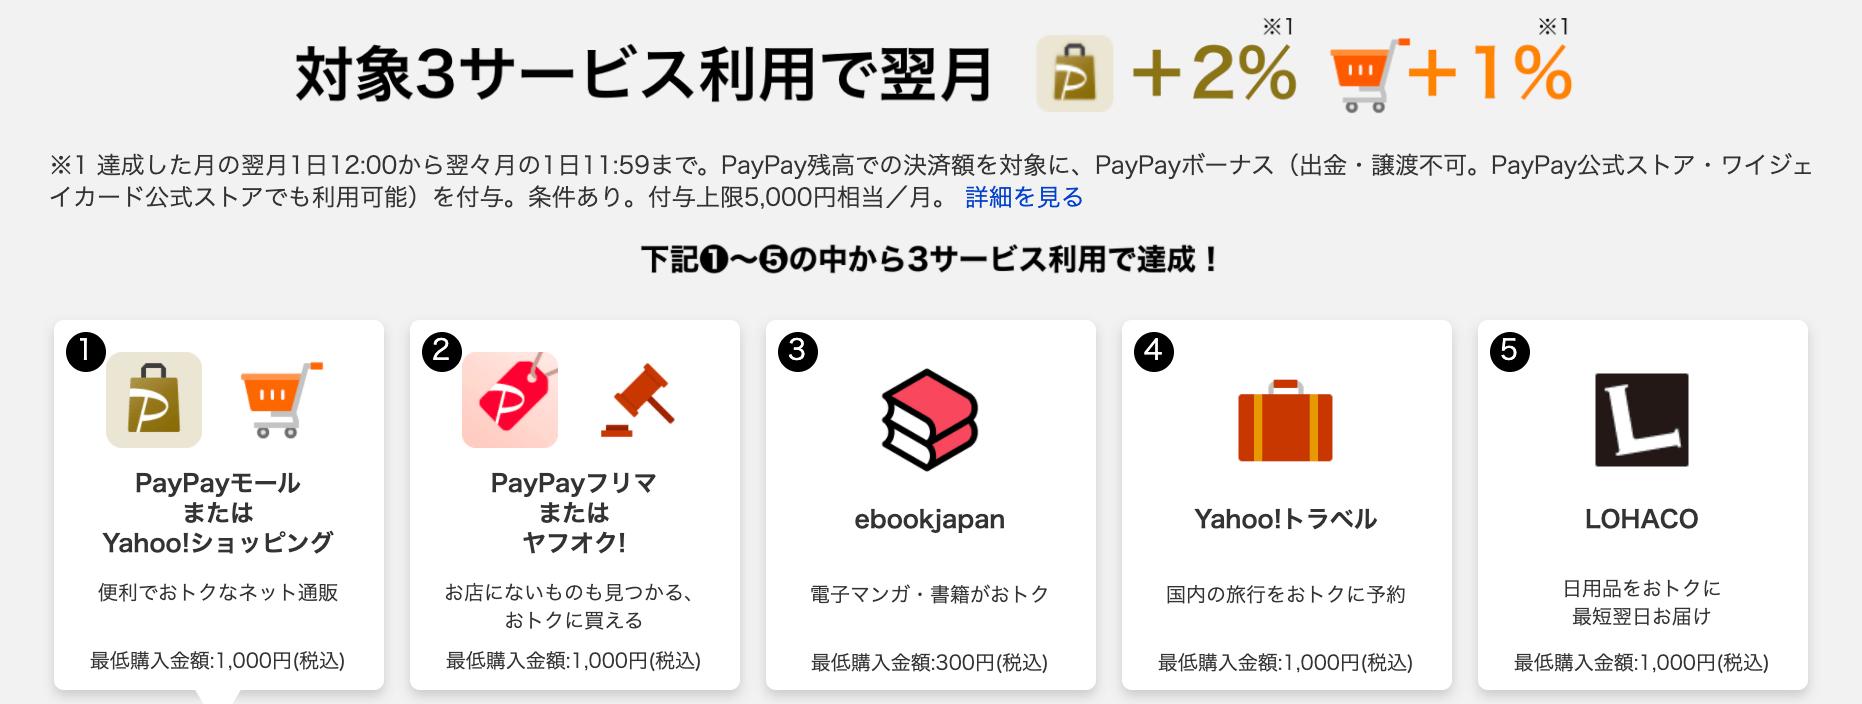 PayPay STEP サービス利用